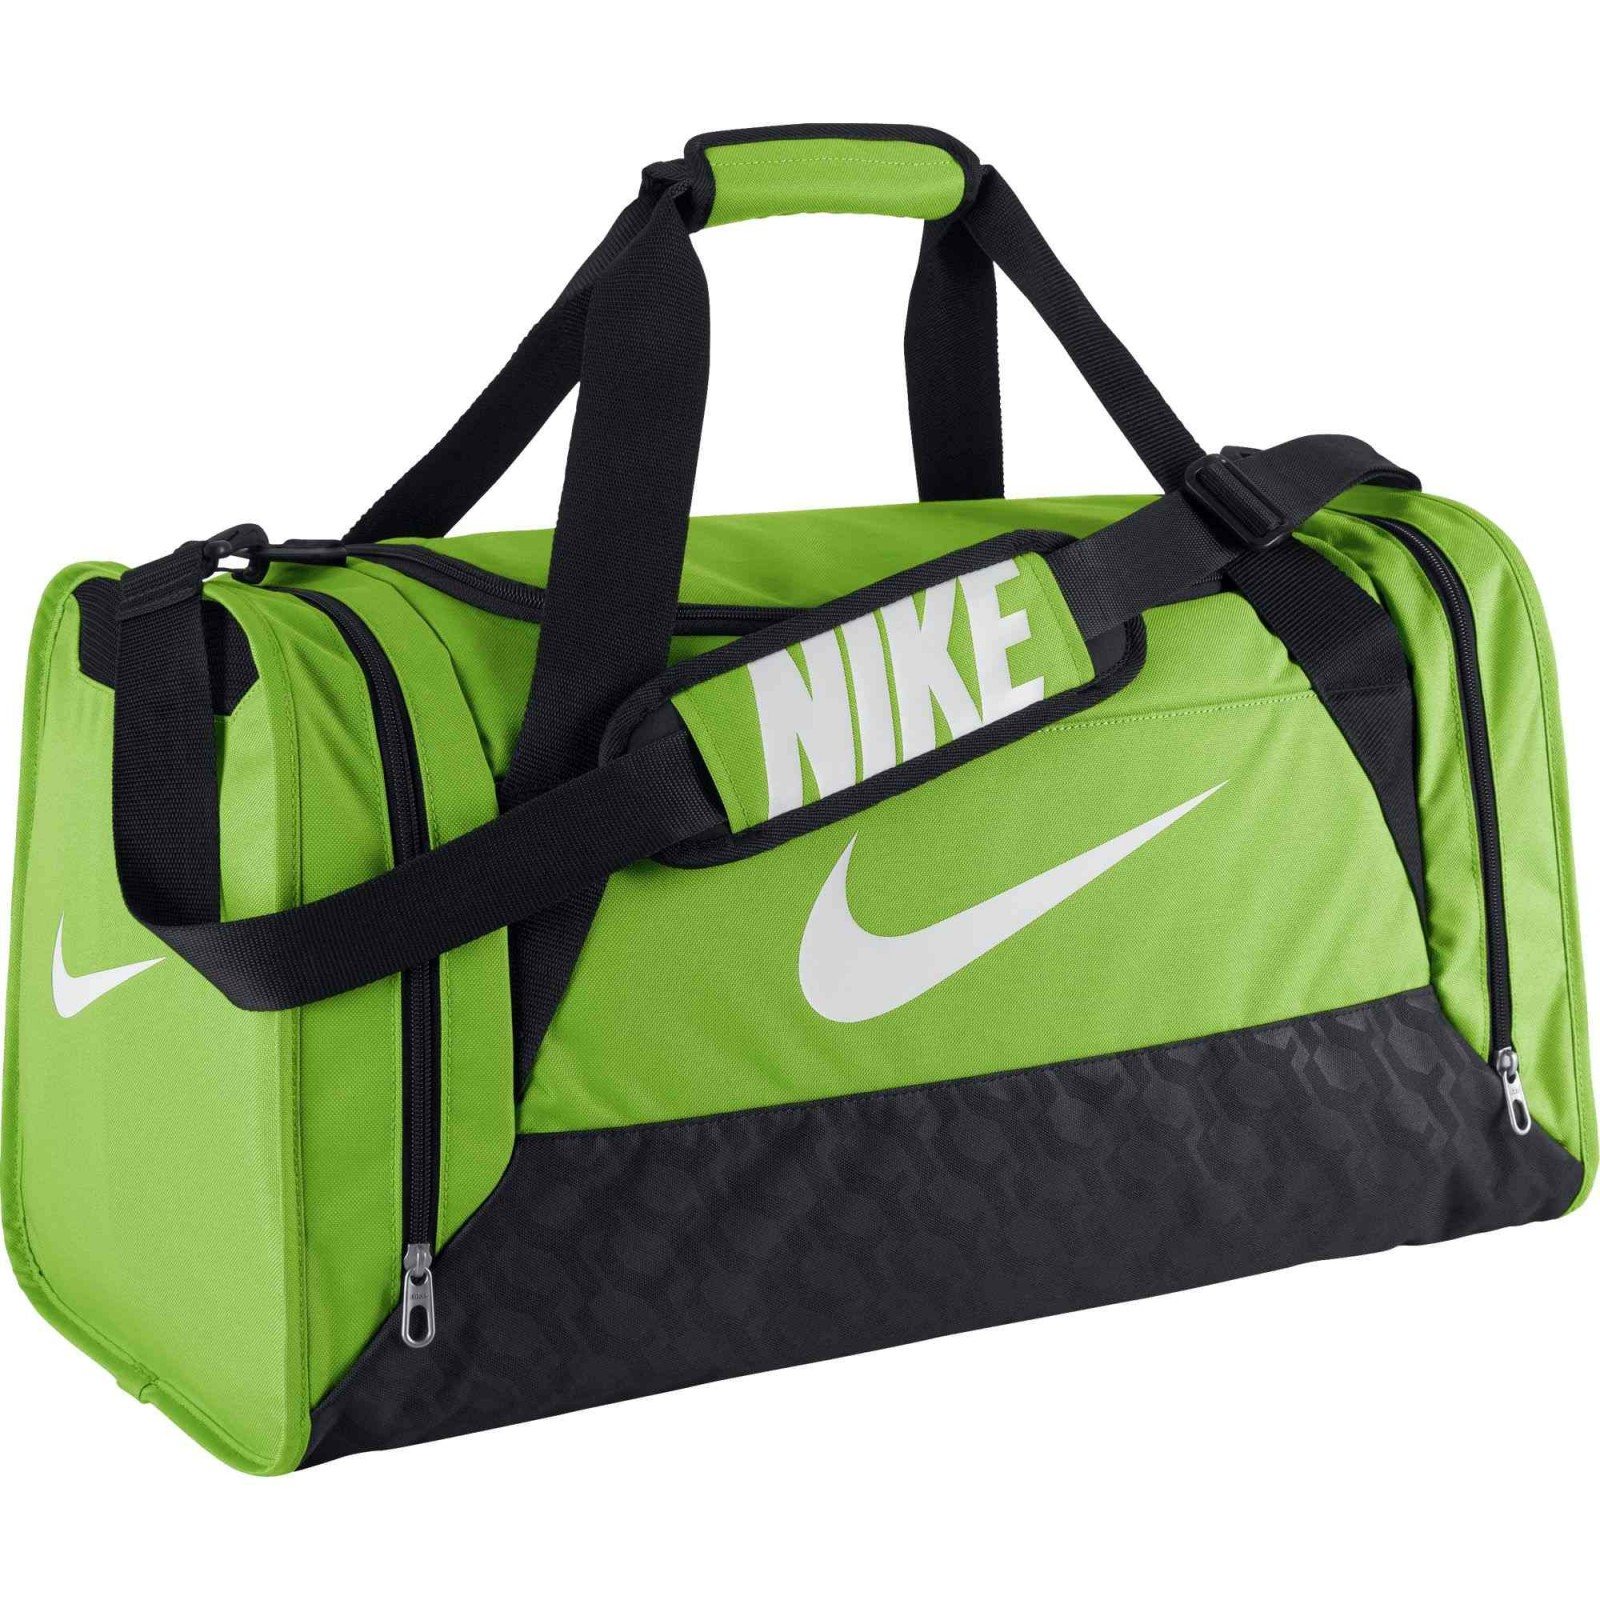 Taška Nike BRASILIA 6 DUFFEL MEDIUM  228ebeddb49